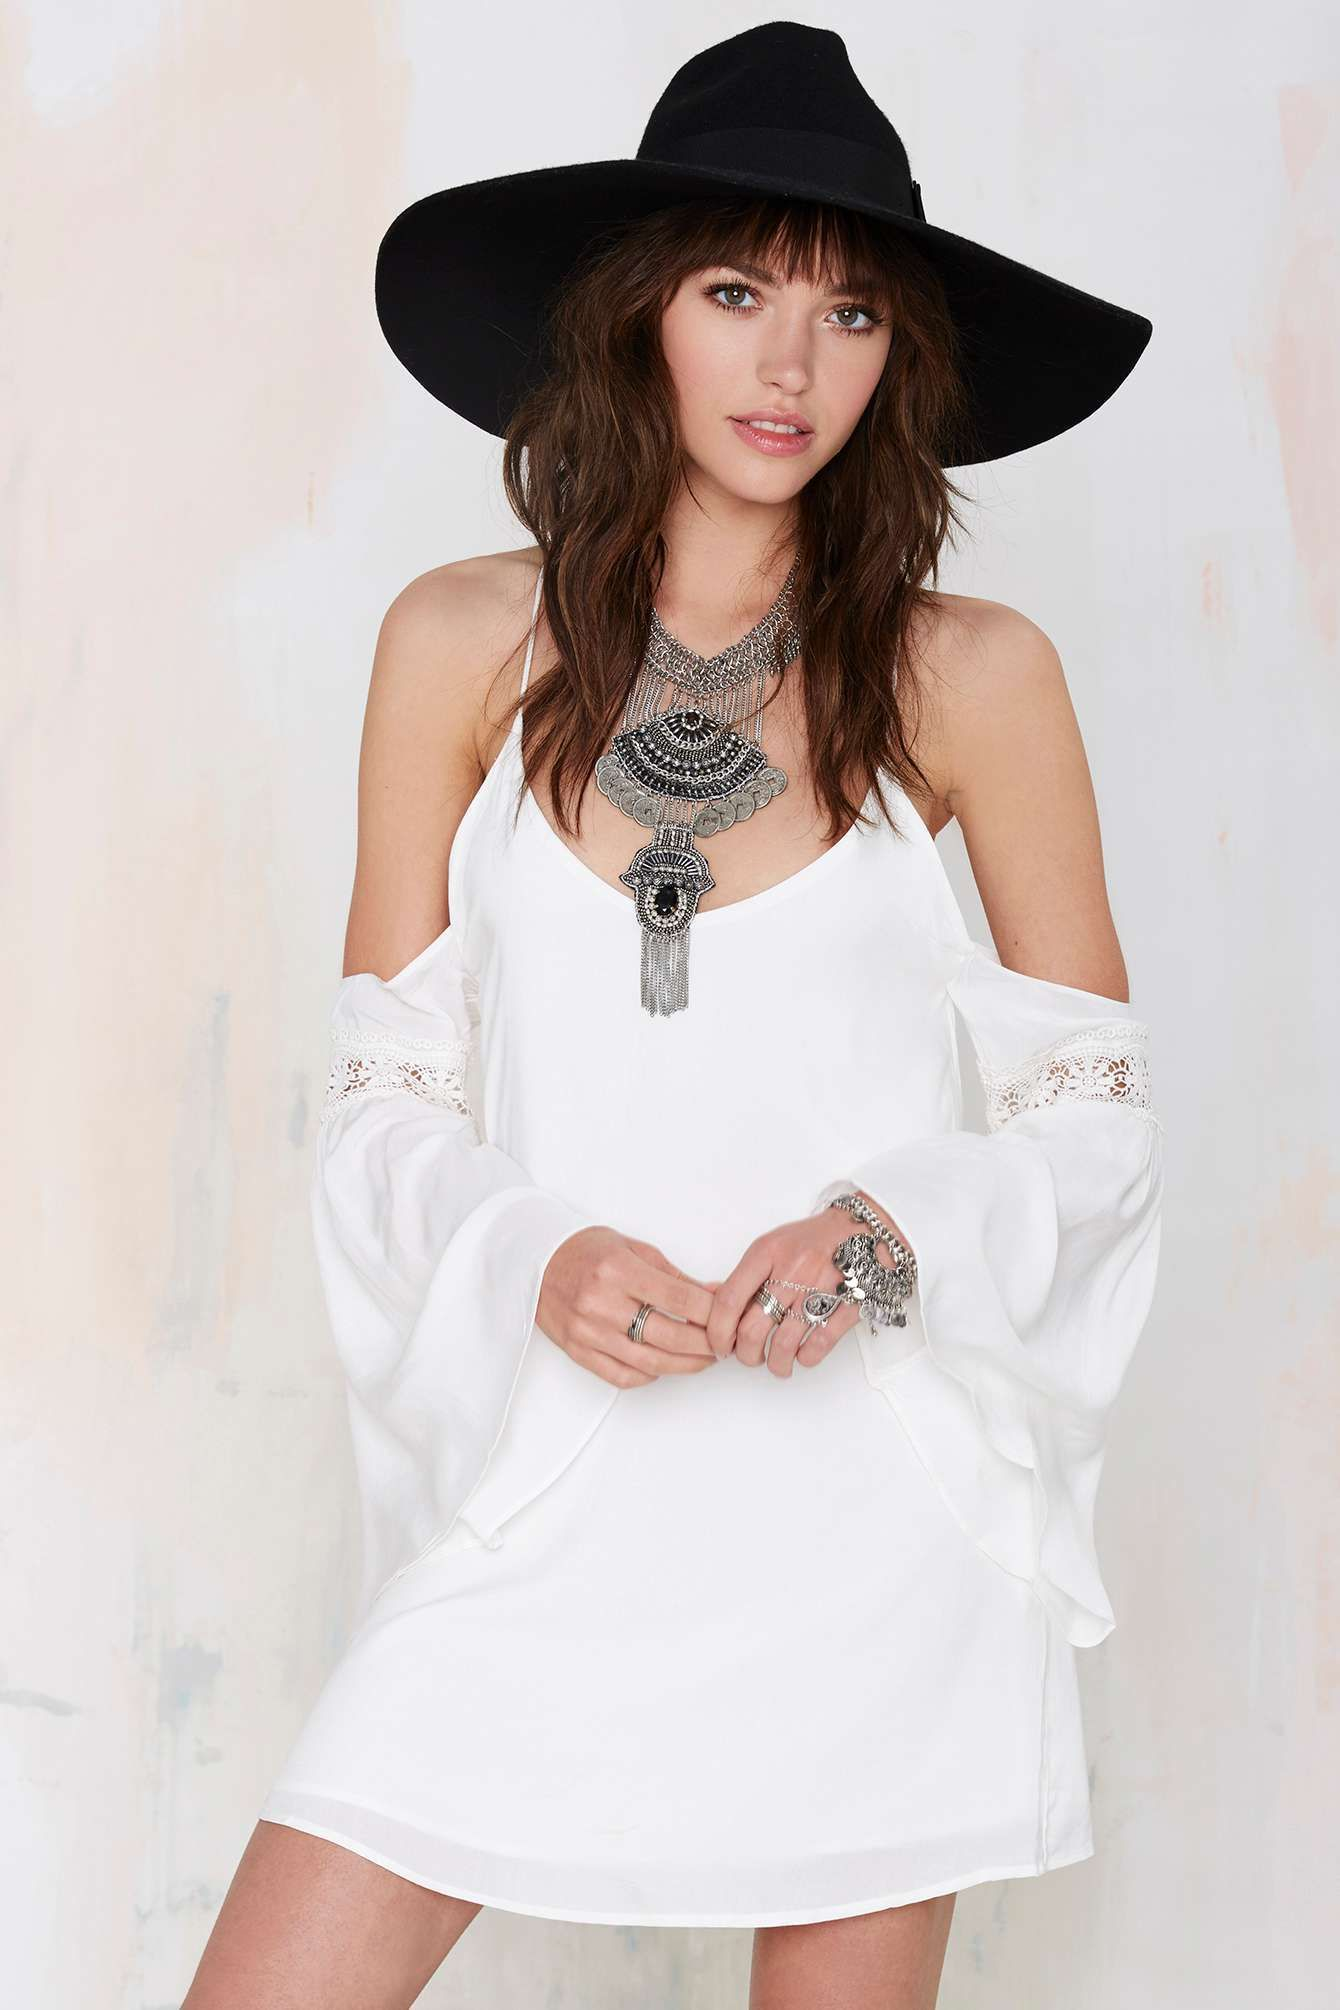 b4e1e1964f520 Belica Cutout Dress | Fashion | Pinterest